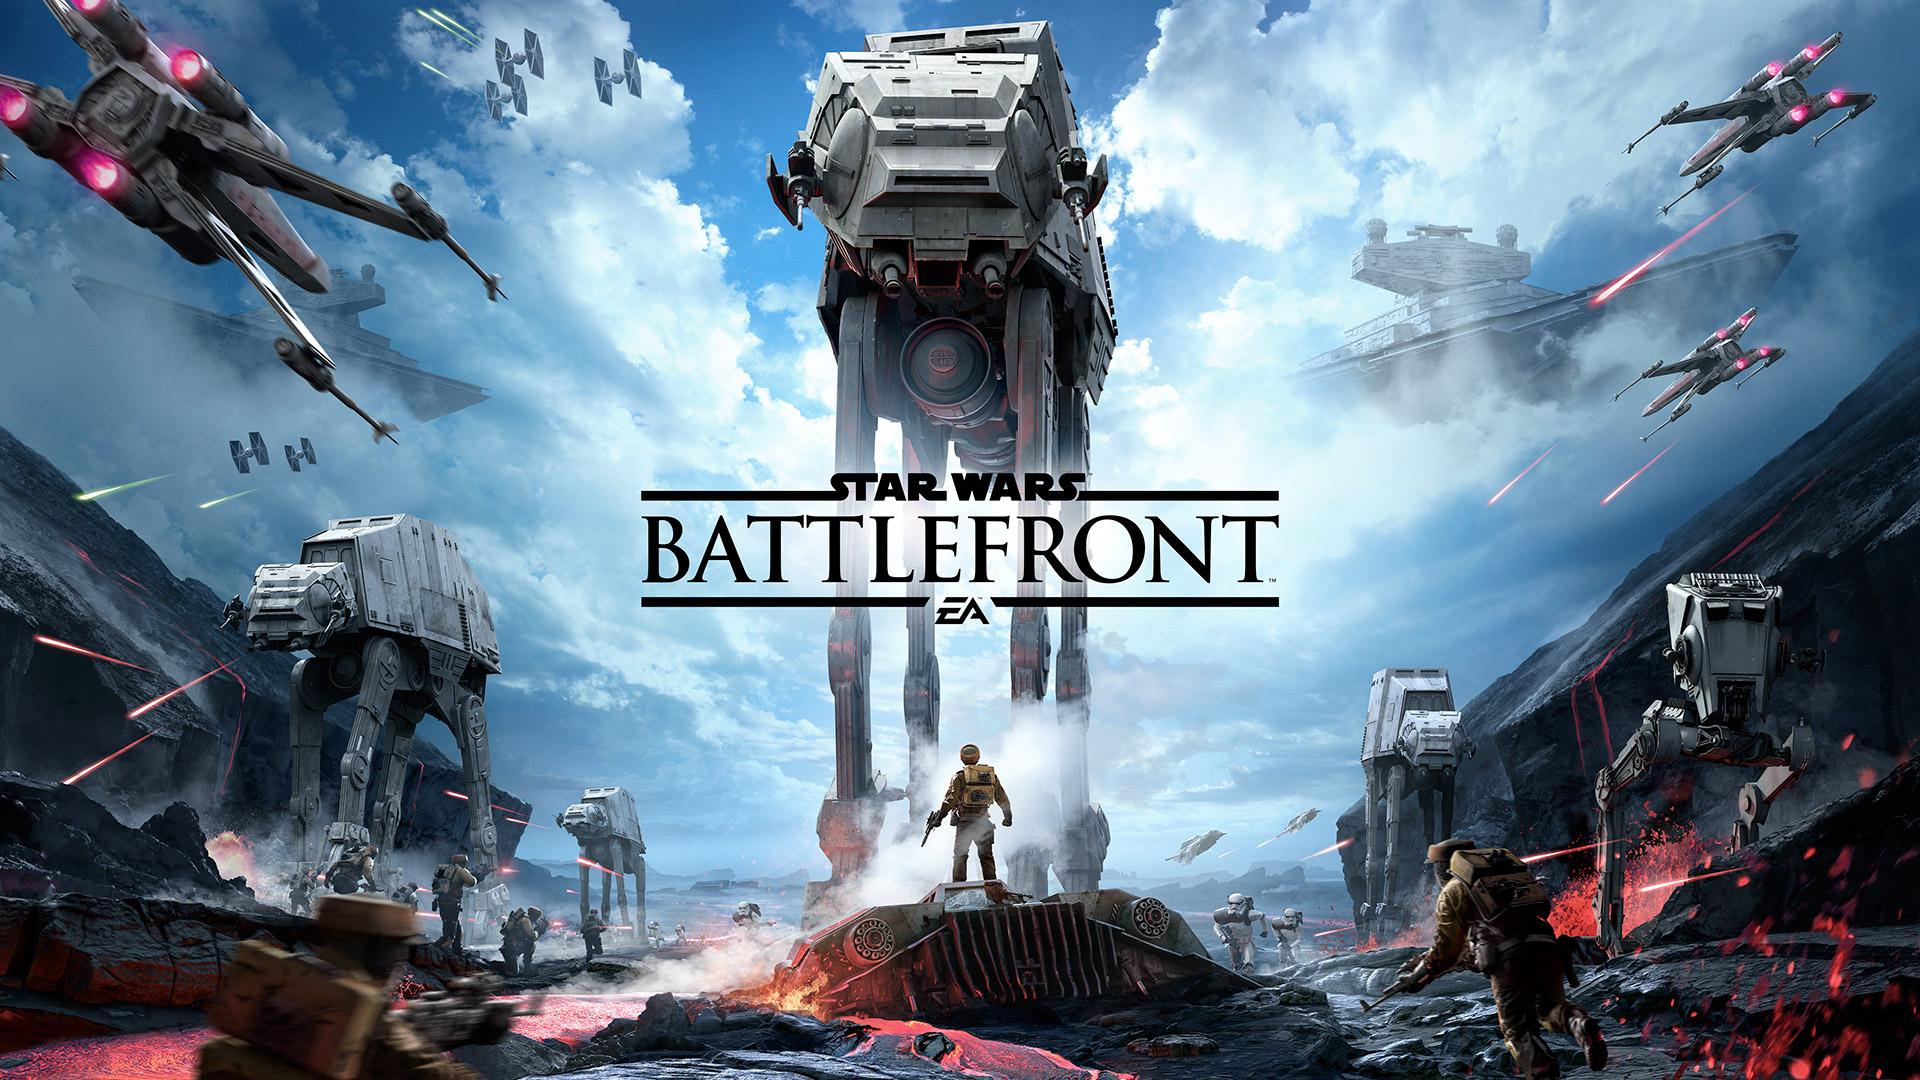 star wars™ battlefront™ wallpapers - star wars - official ea site